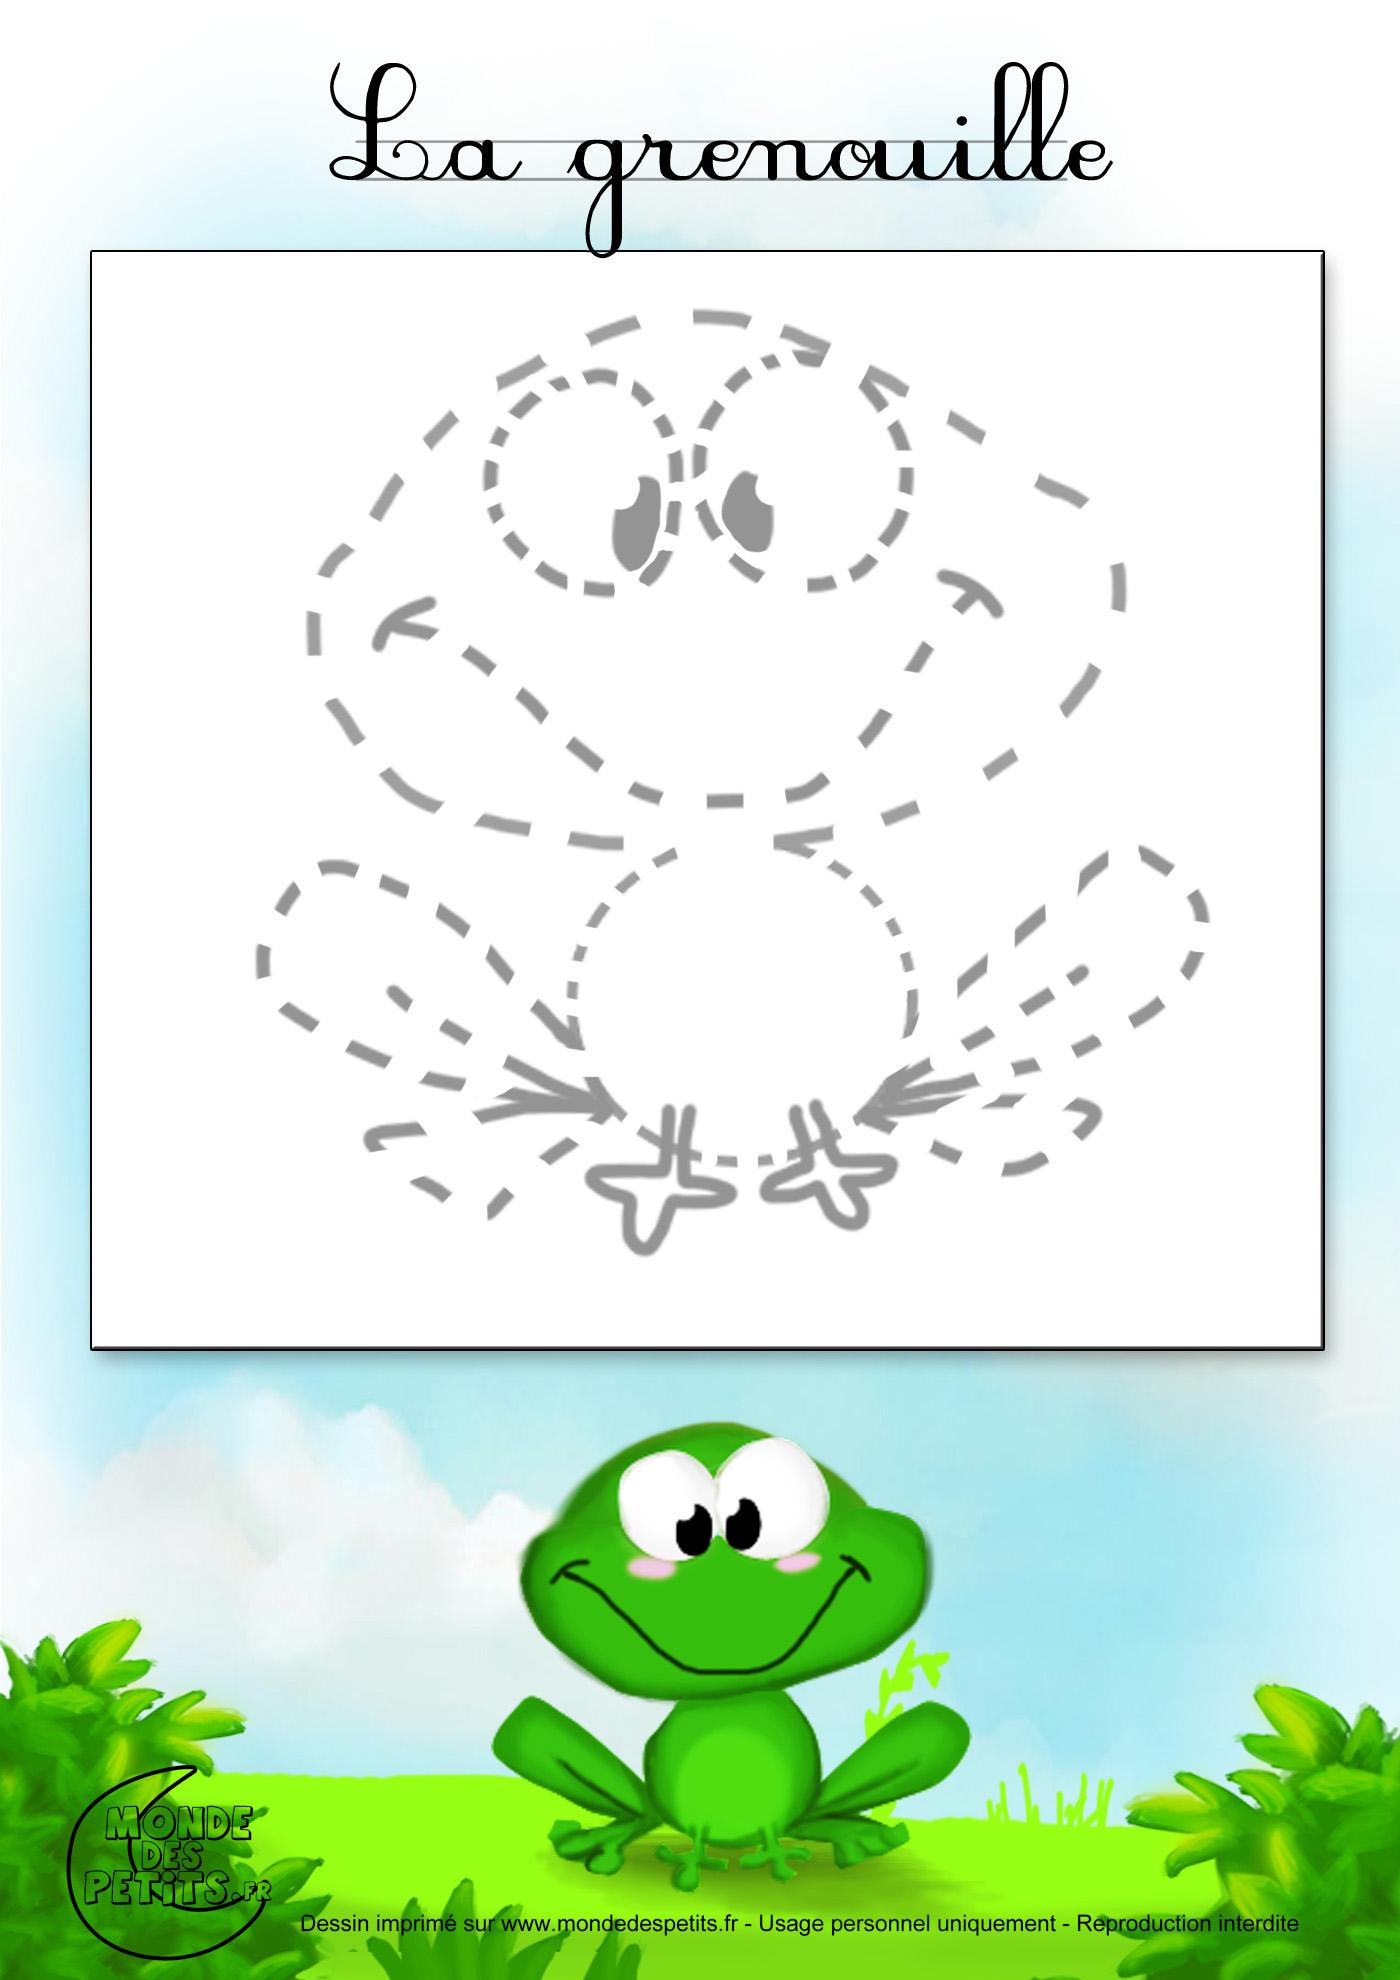 Monde des petits tutoriel vid o - Dessin de grenouille a imprimer ...